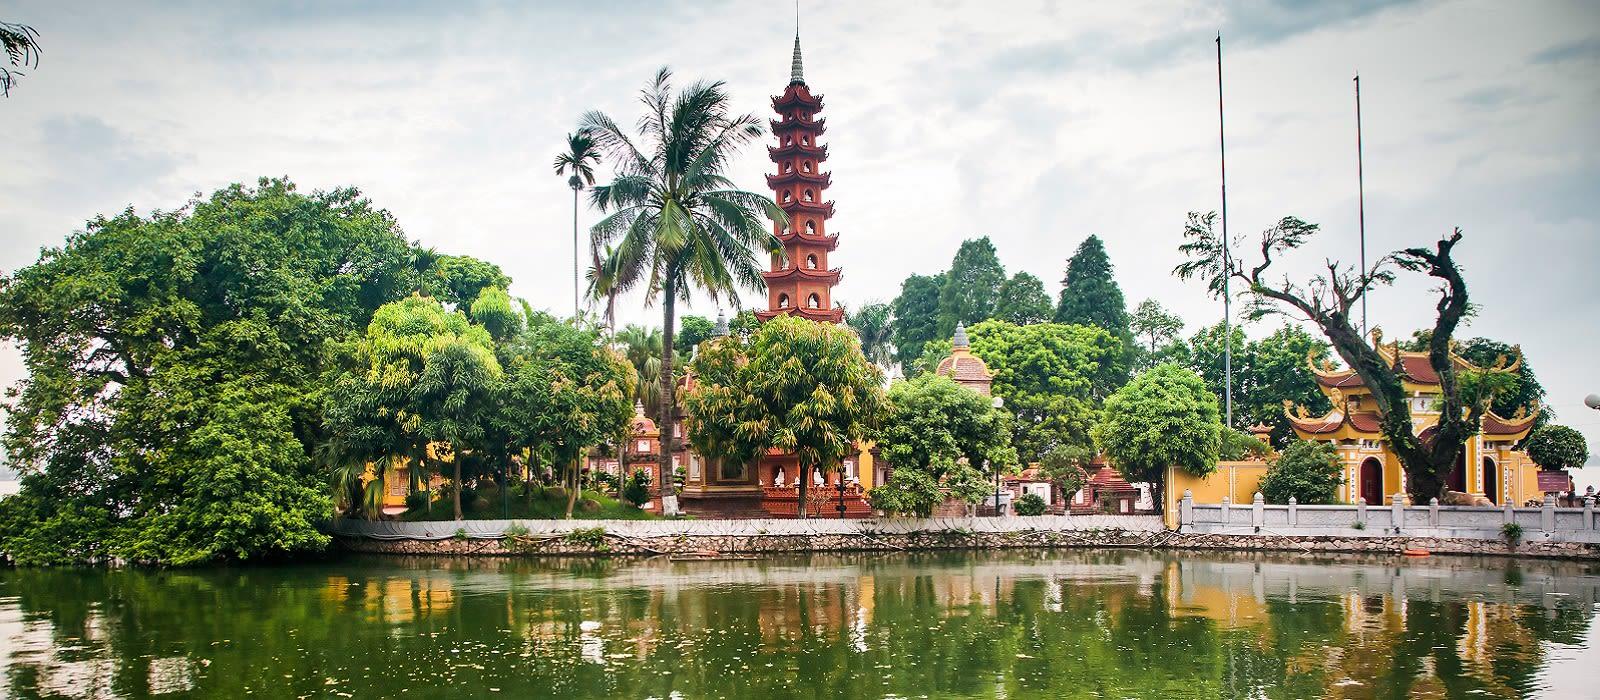 Exclusive Travel Tips For Your Destination Hanoi In Vietnam